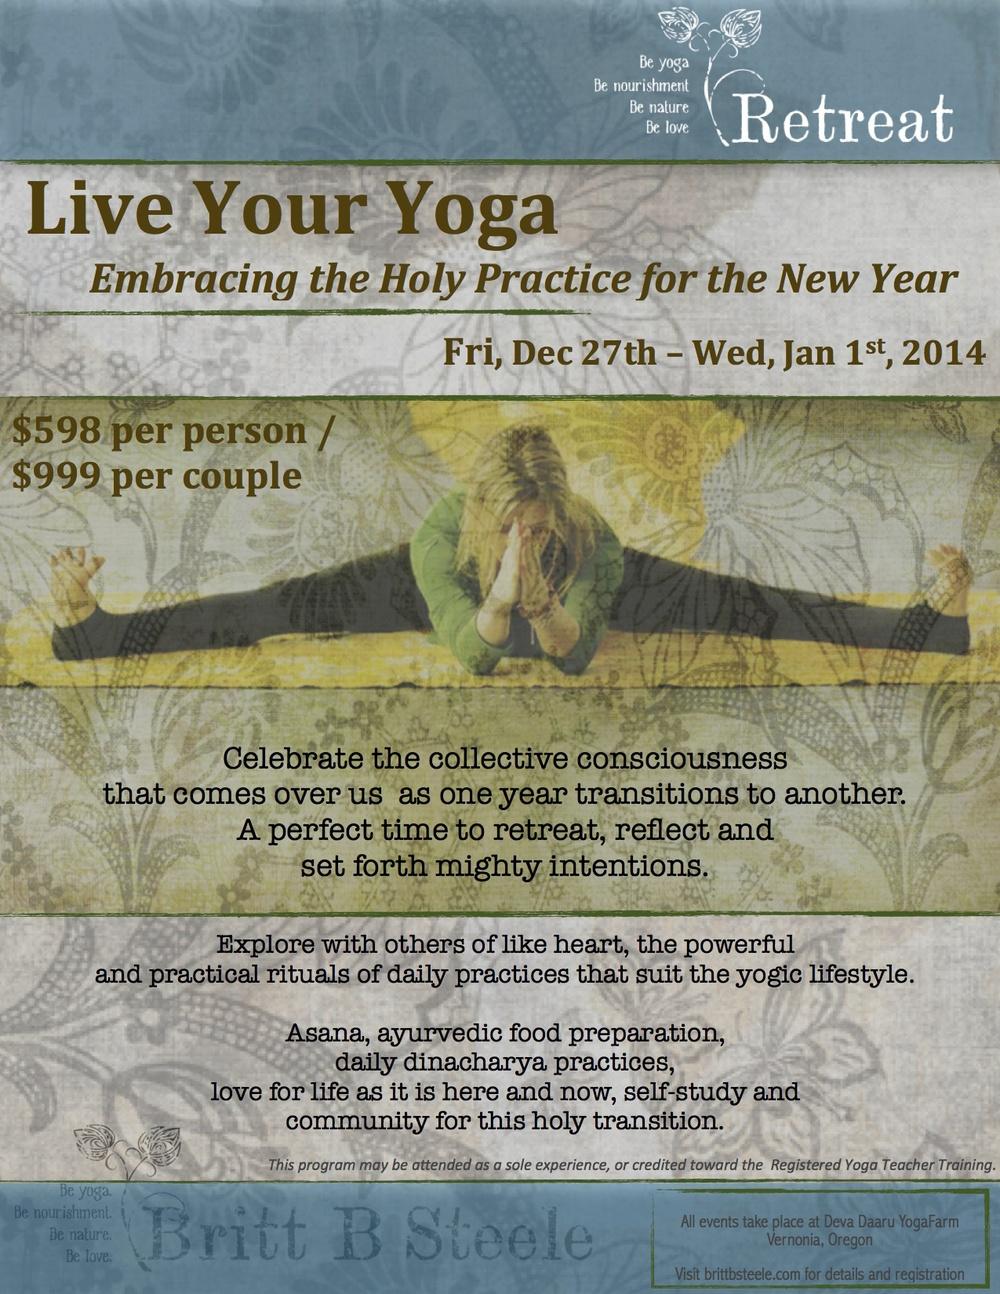 Retreat- New Year 2014 - Live Your Yoga.jpg